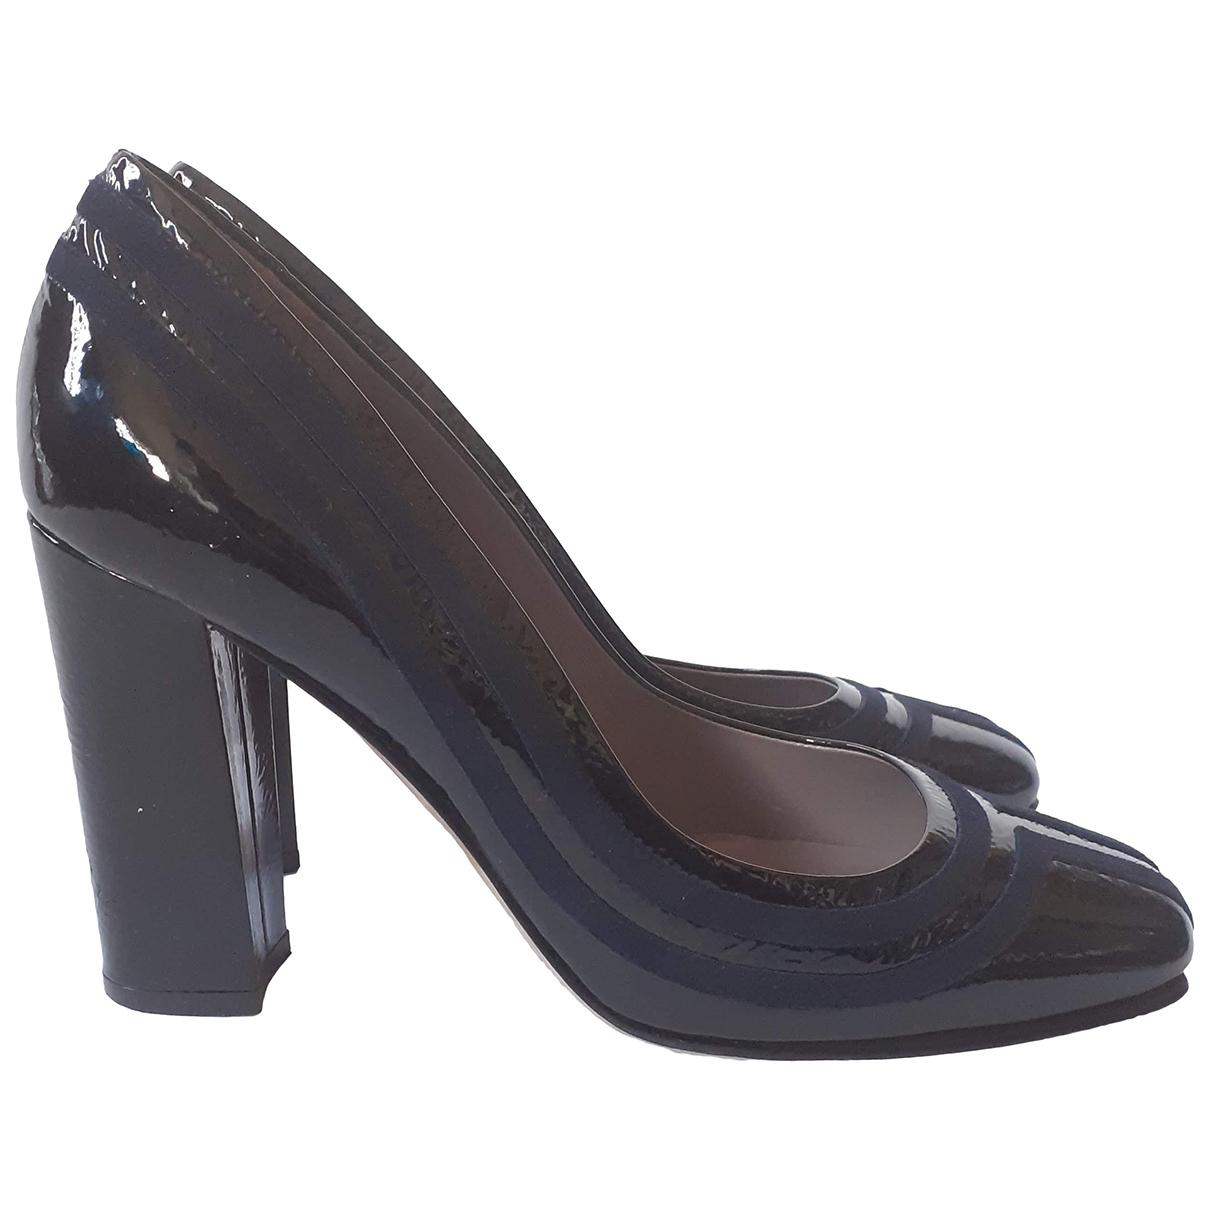 Anya Hindmarch - Escarpins   pour femme en cuir verni - noir